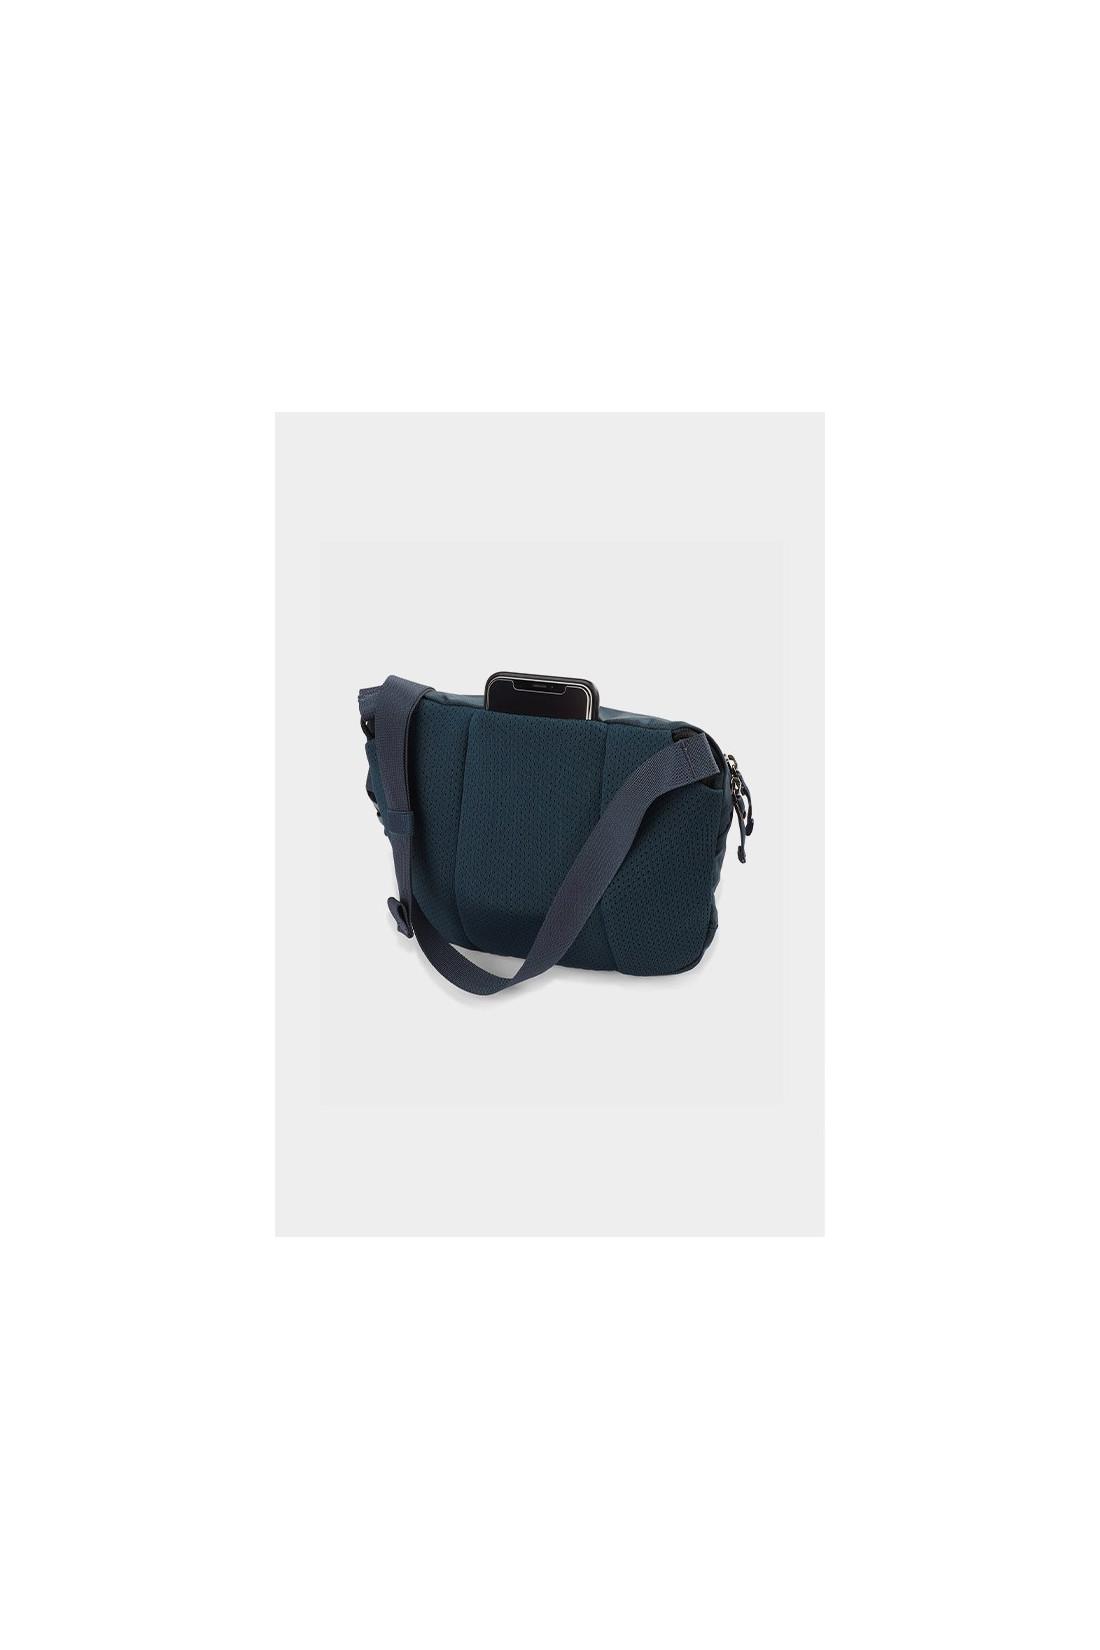 ARC'TERYX / Mantis 2 waistpack Fortune